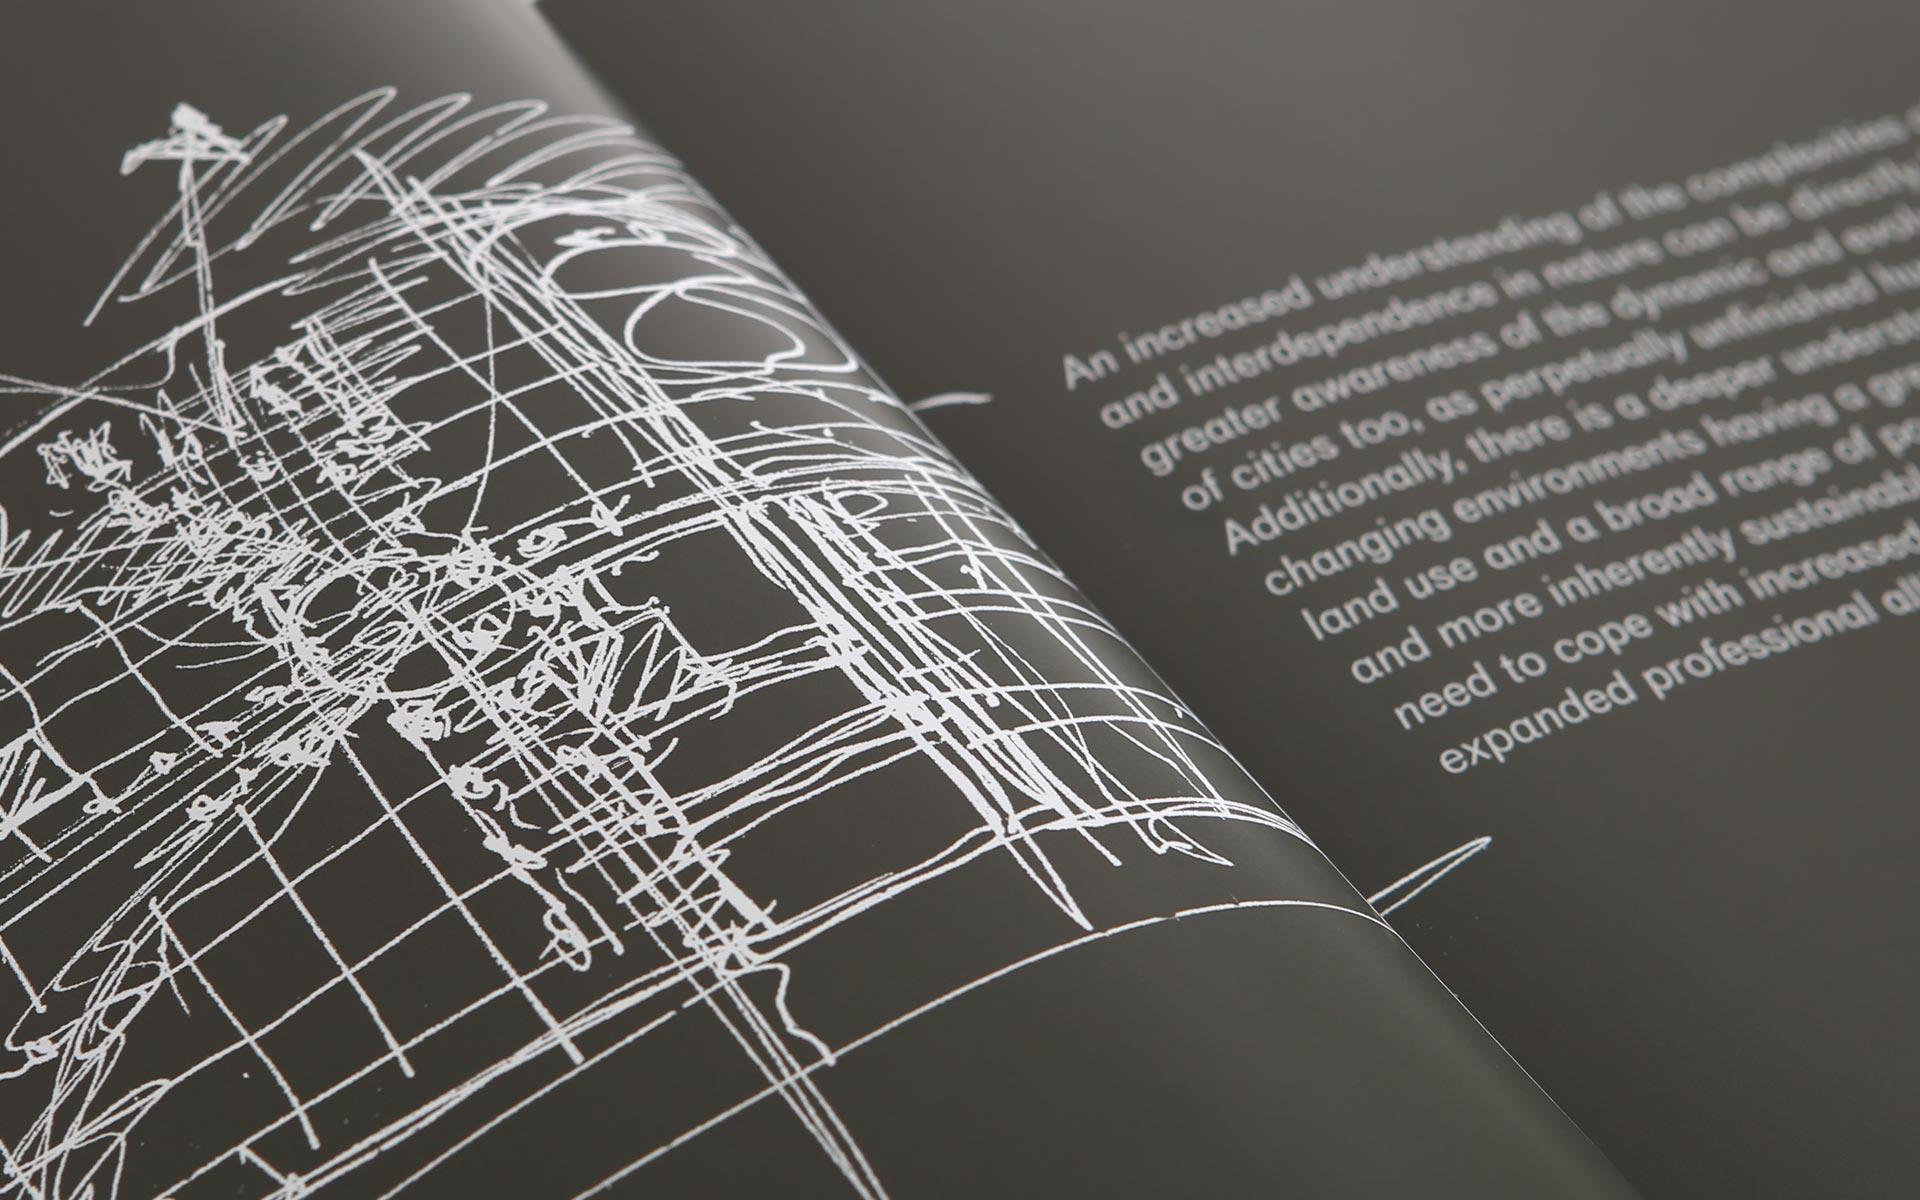 pfs-landscape-architects-book-design-5